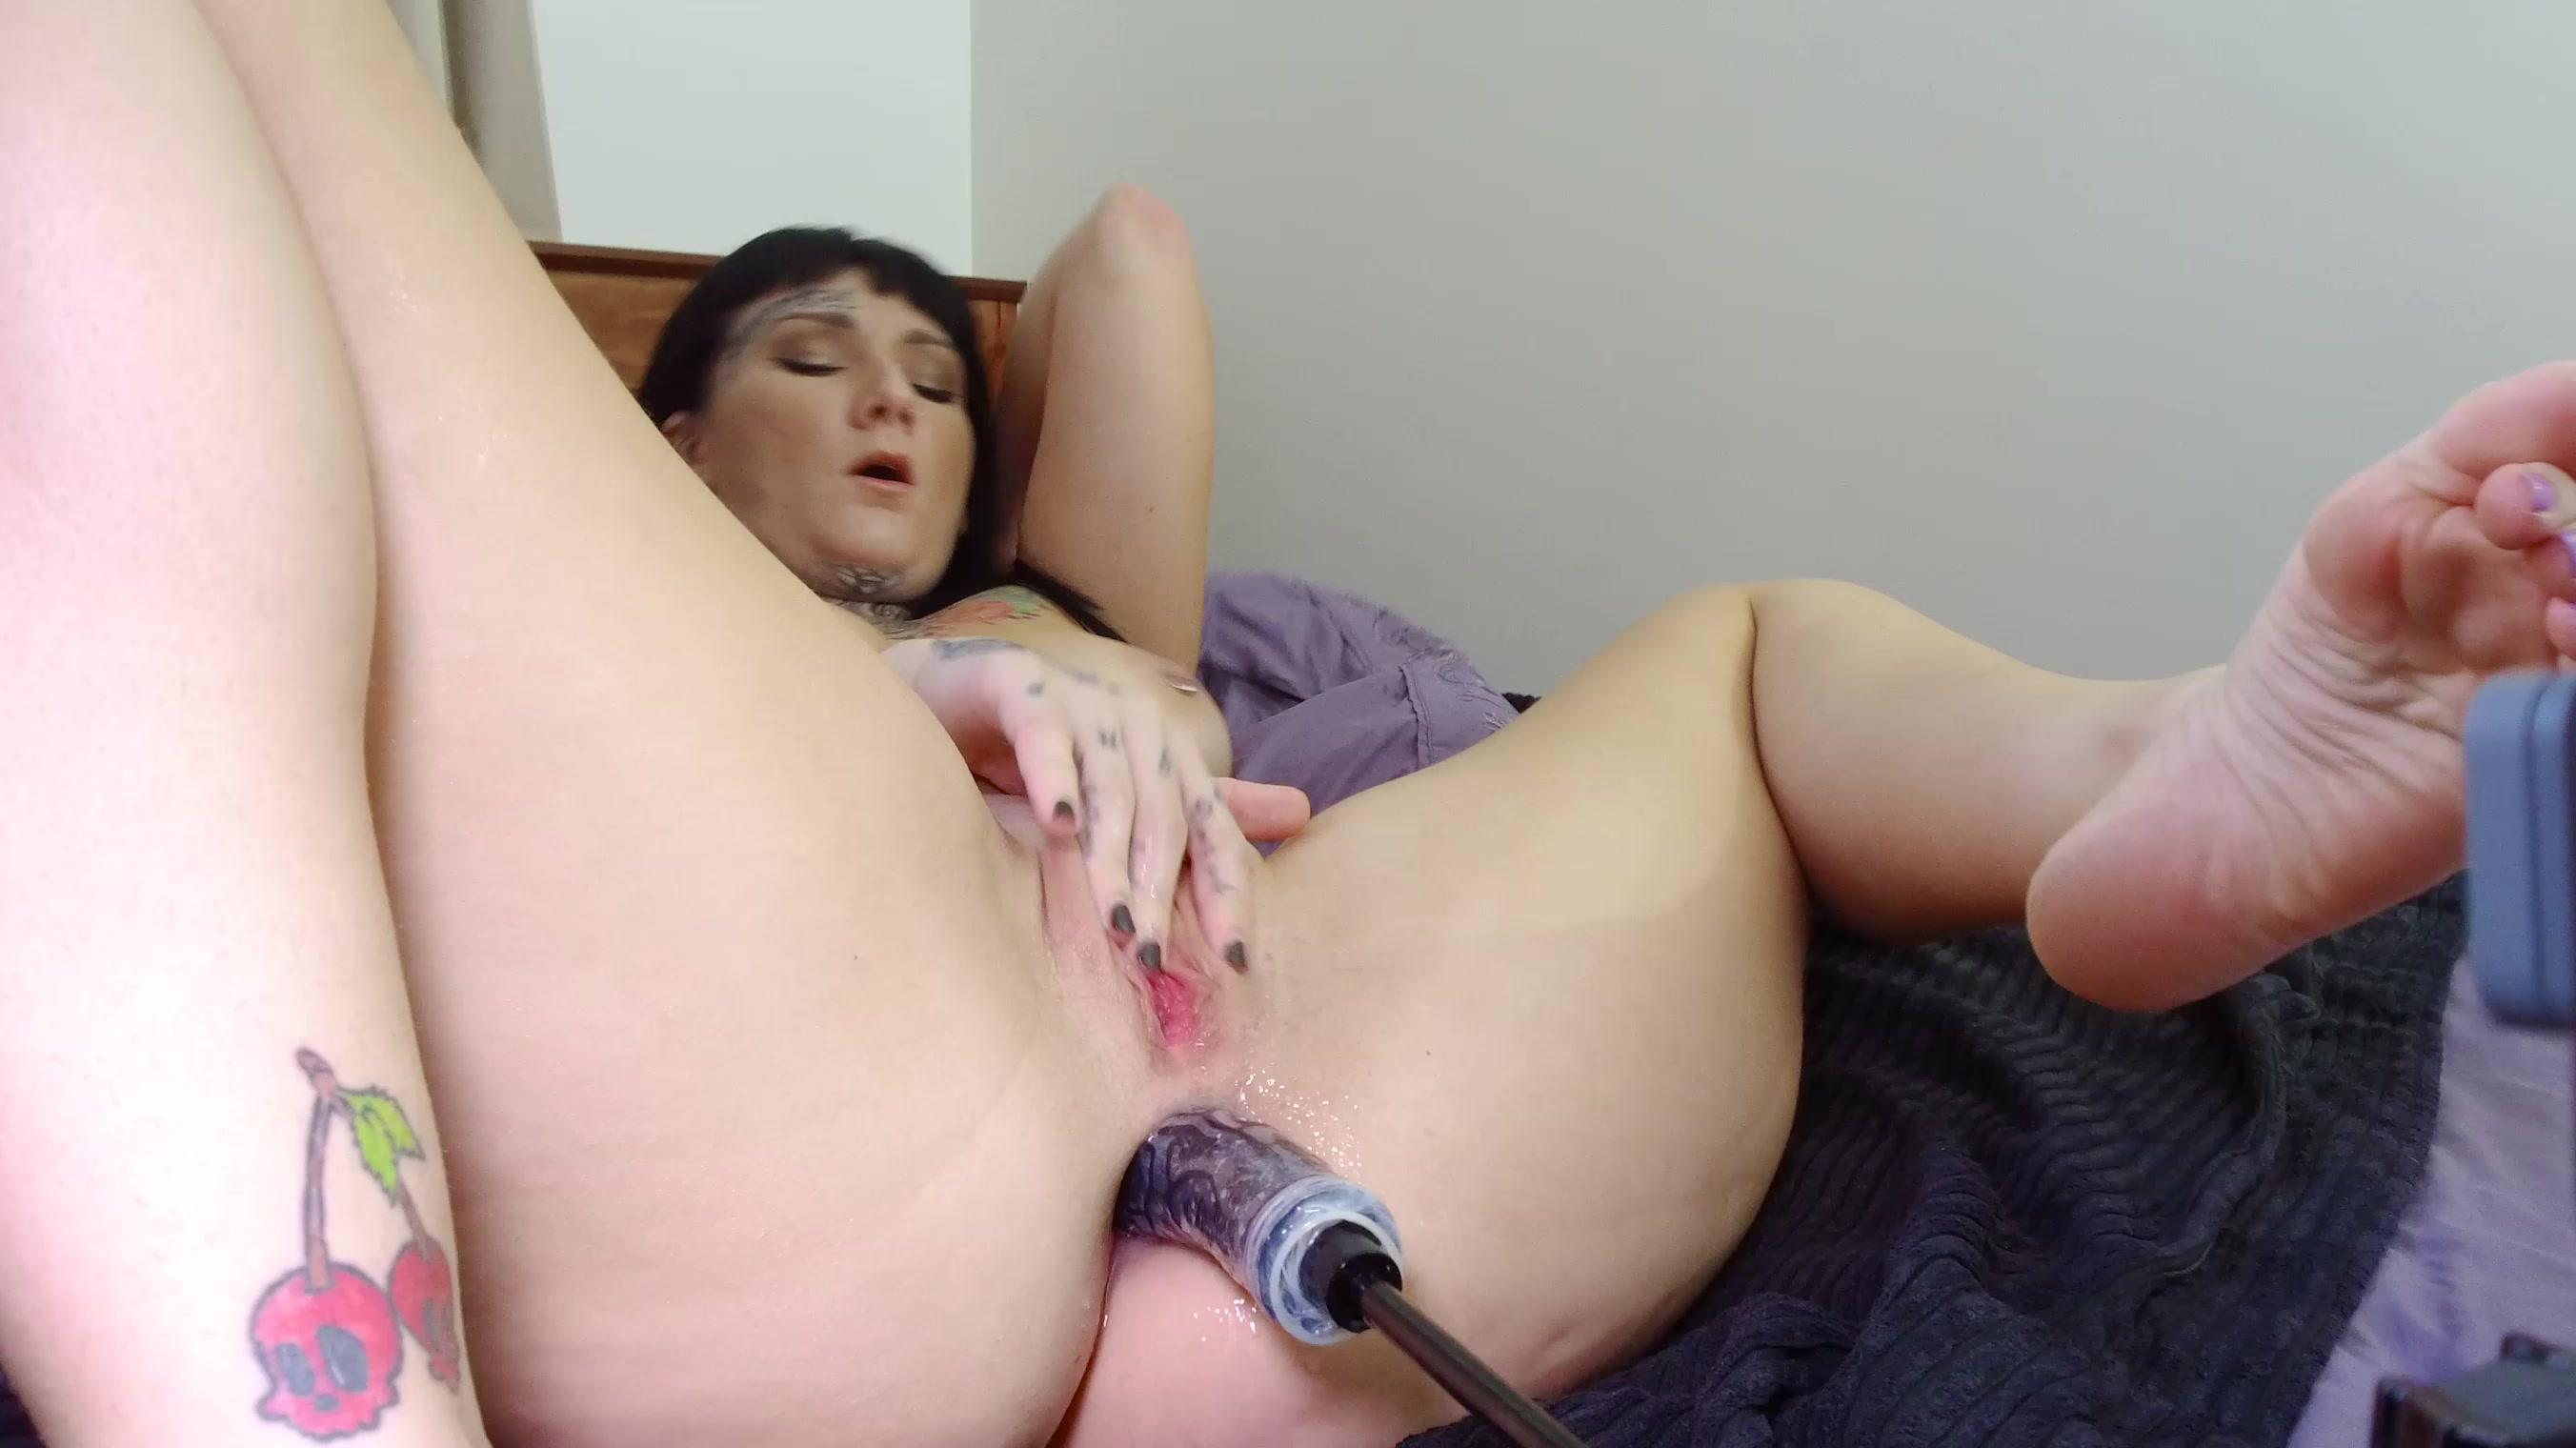 legal-blowjob-sick-porn-fuck-machine-anal-chase-pornstar